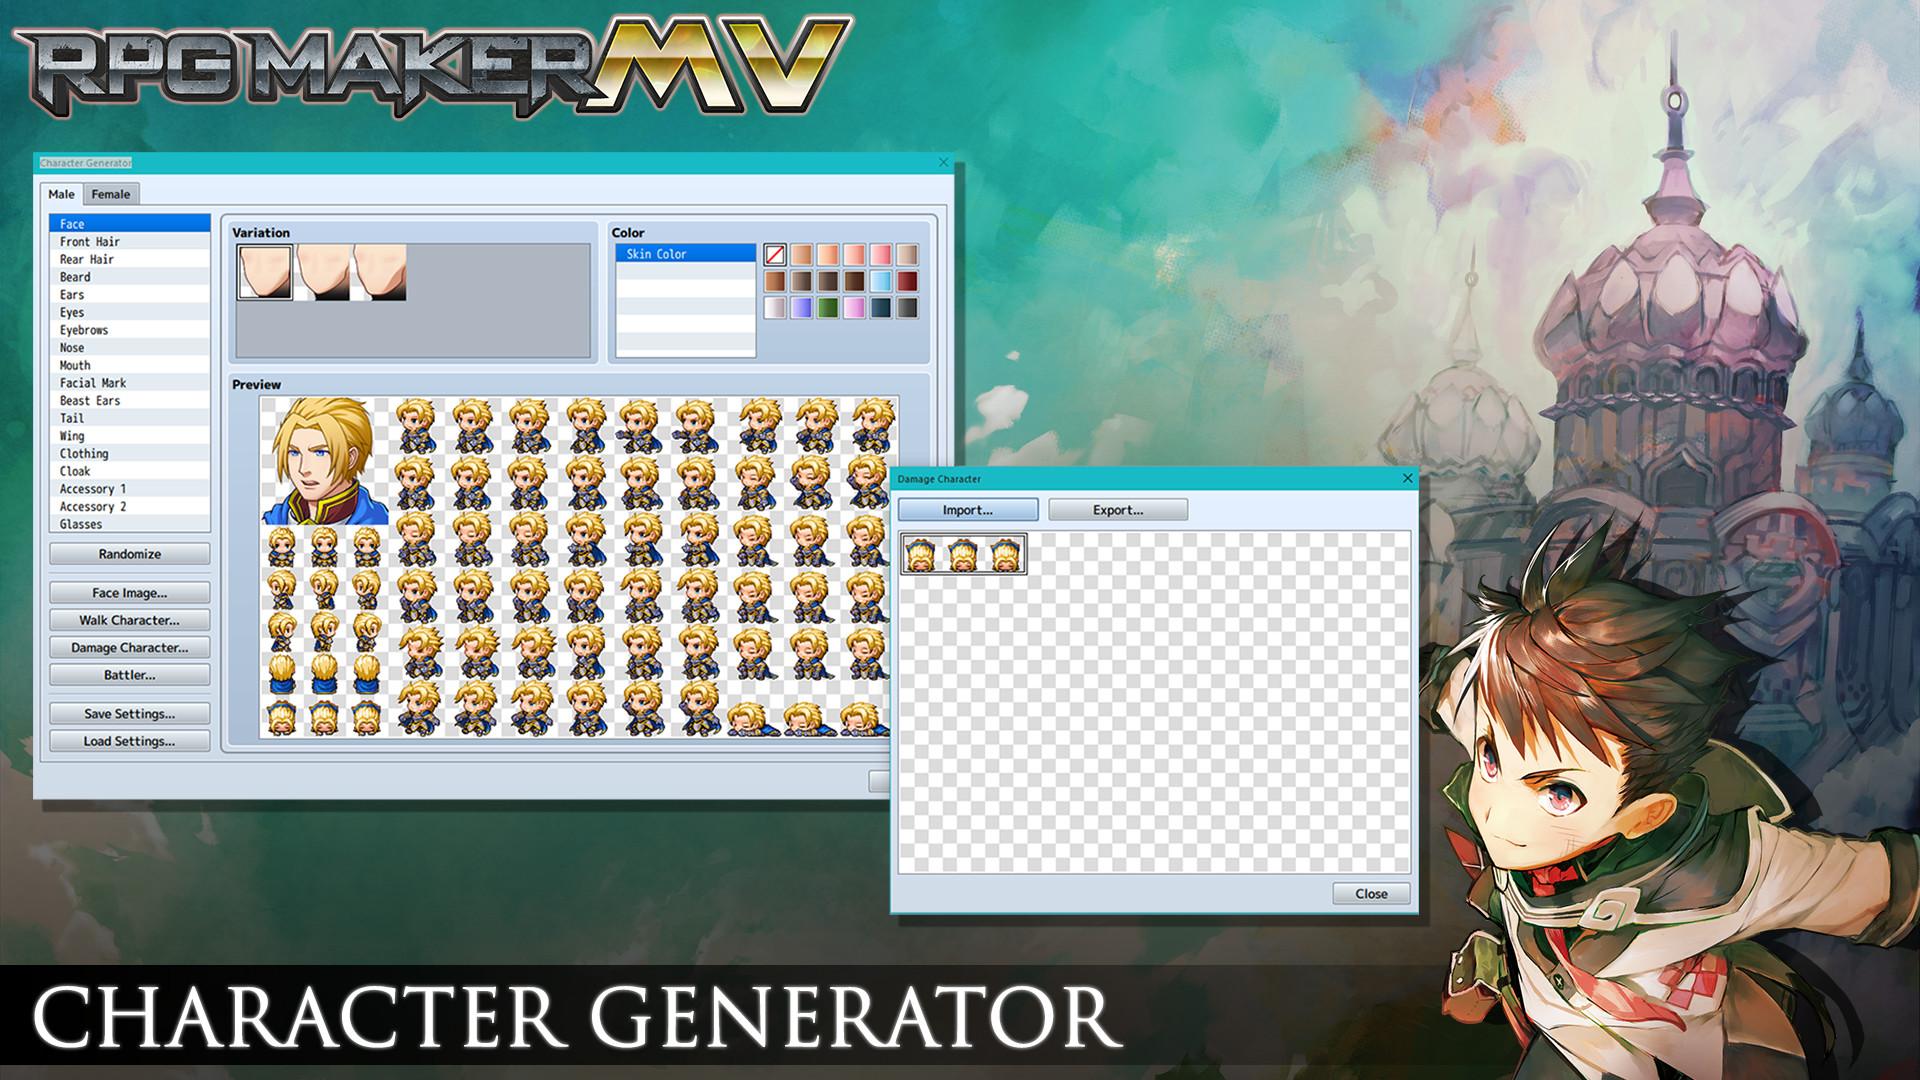 Character generator image - RPG Maker MV - Mod DB